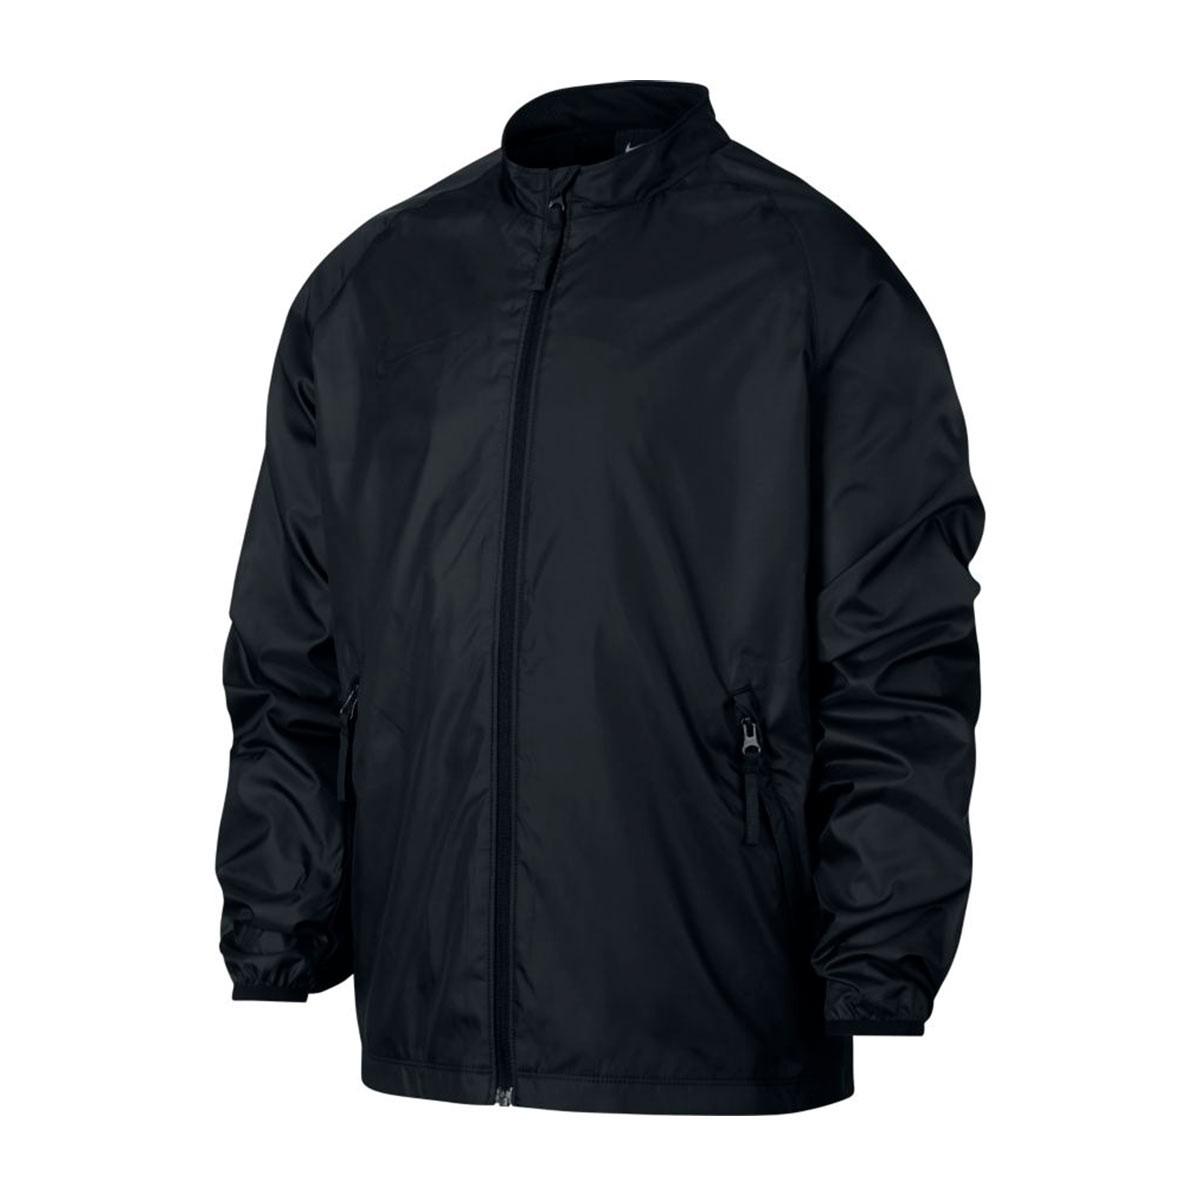 e5e211212fb Jacket Nike Kids Repel Academy Black - Tienda de fútbol Fútbol Emotion